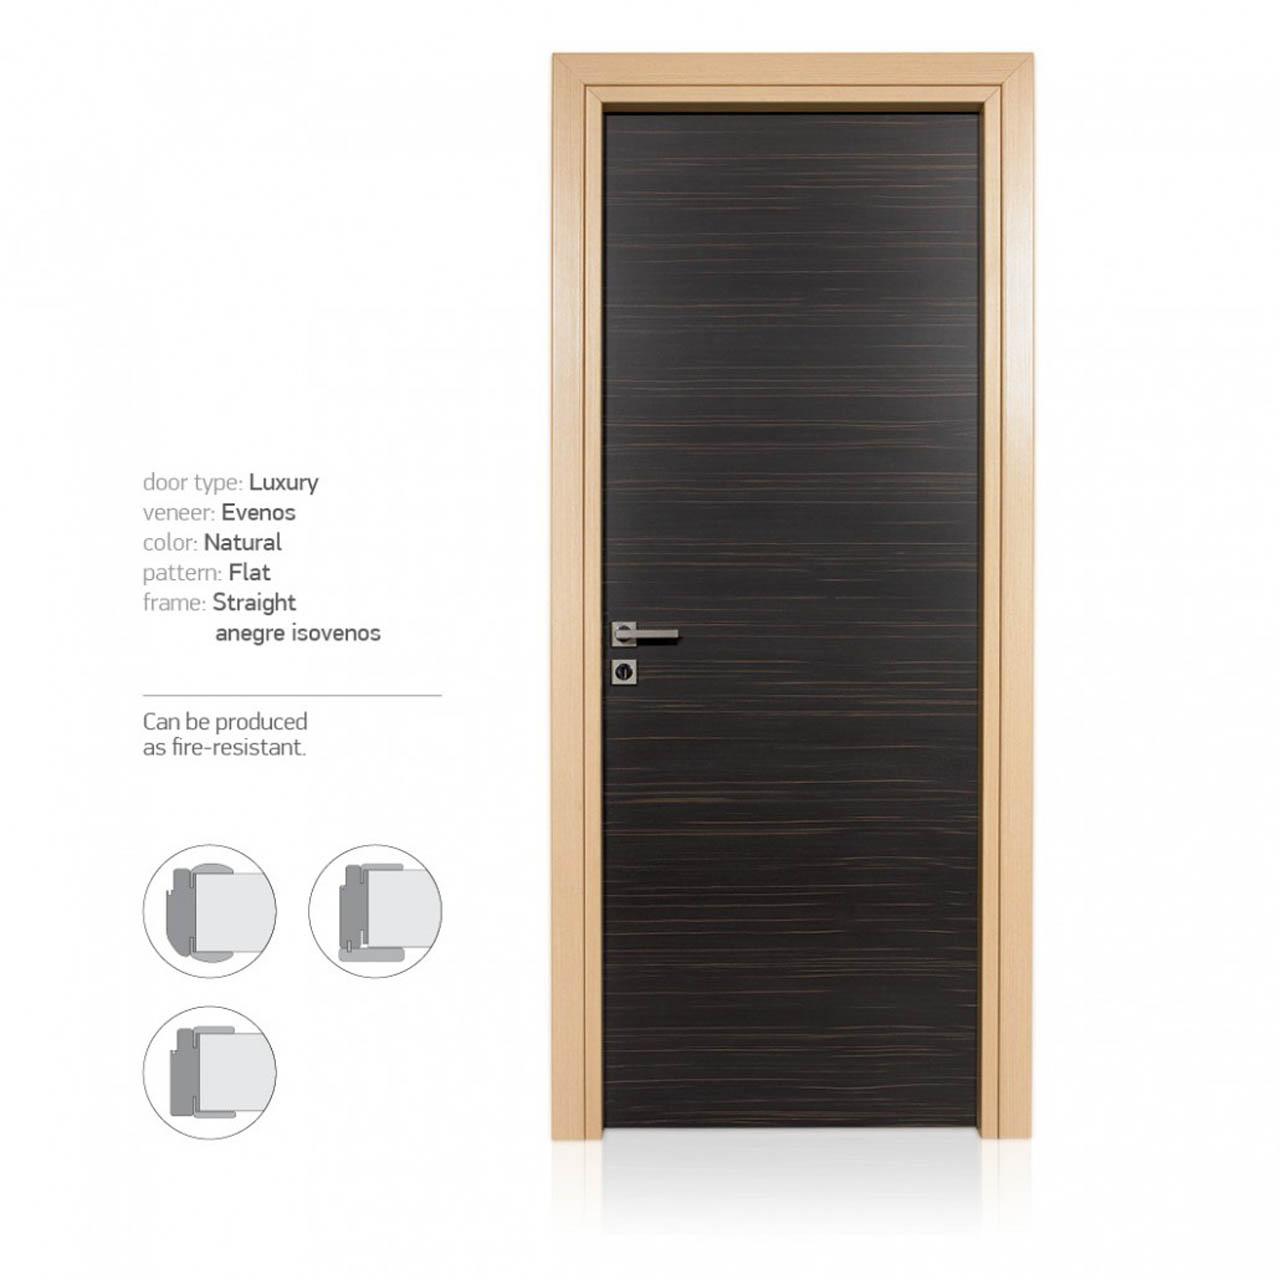 portes-site-luxury-eng7-1030x1030